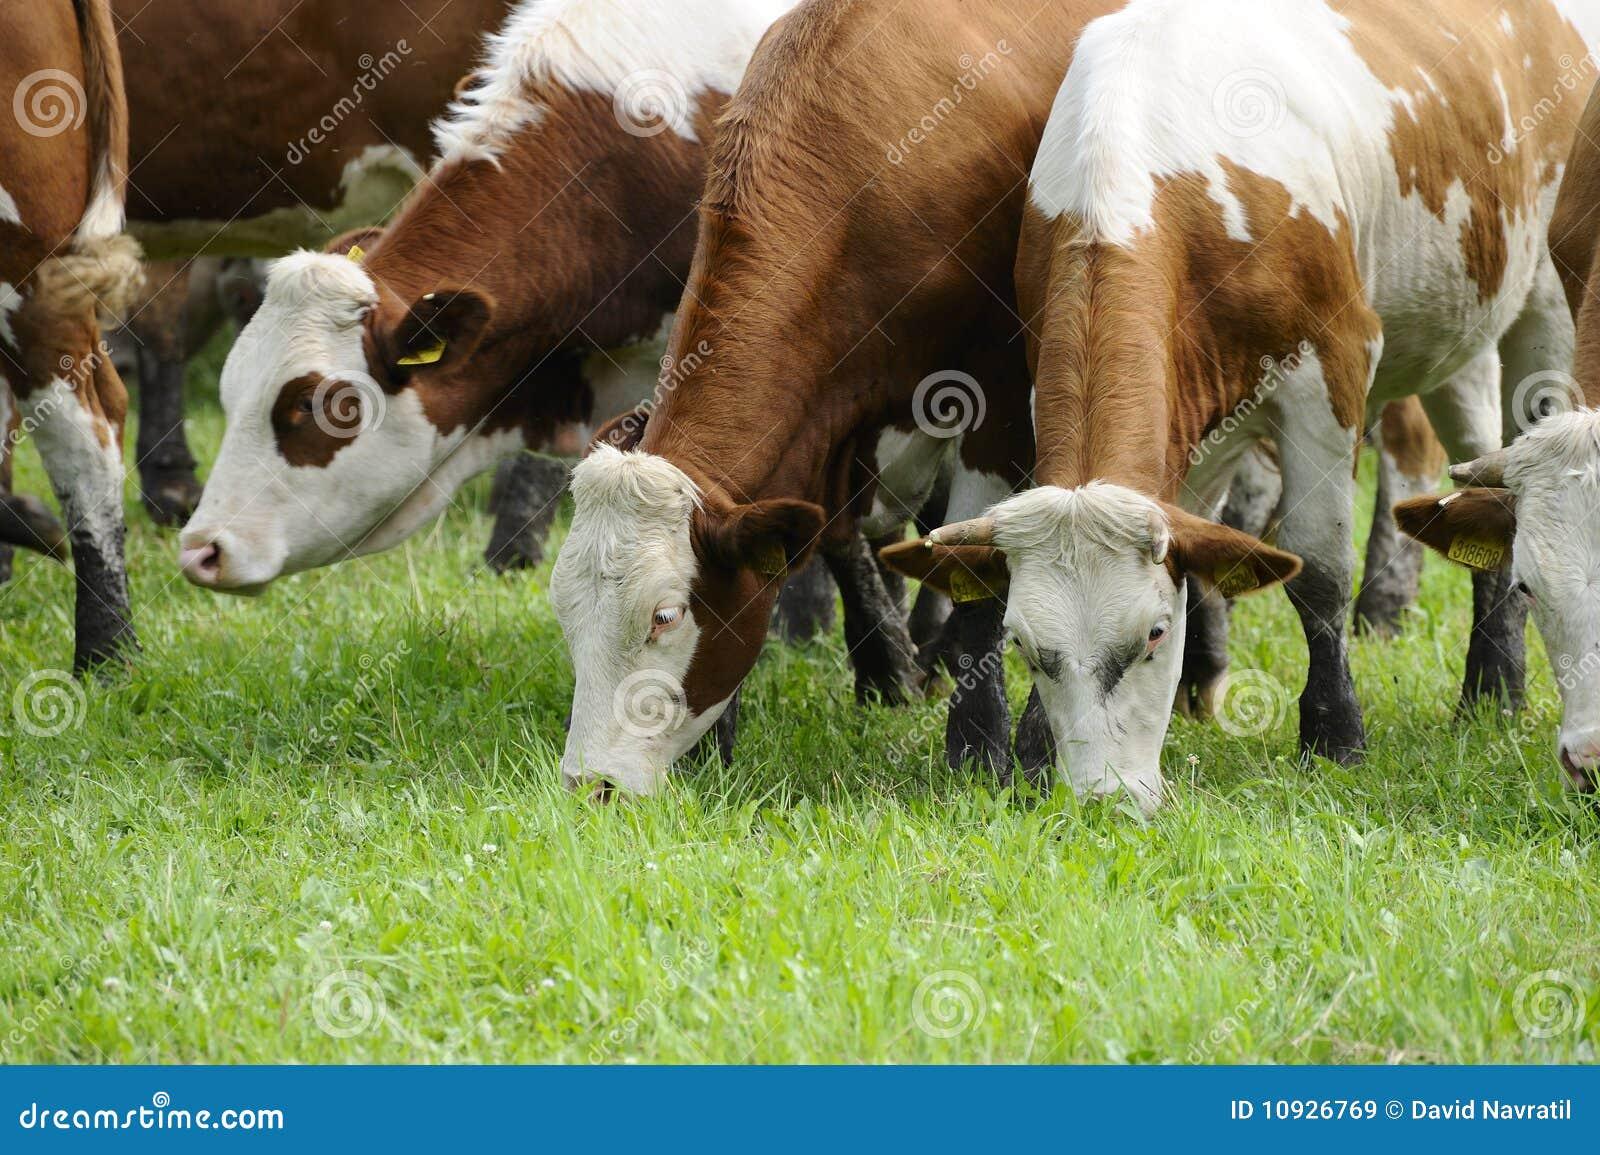 Cow drove